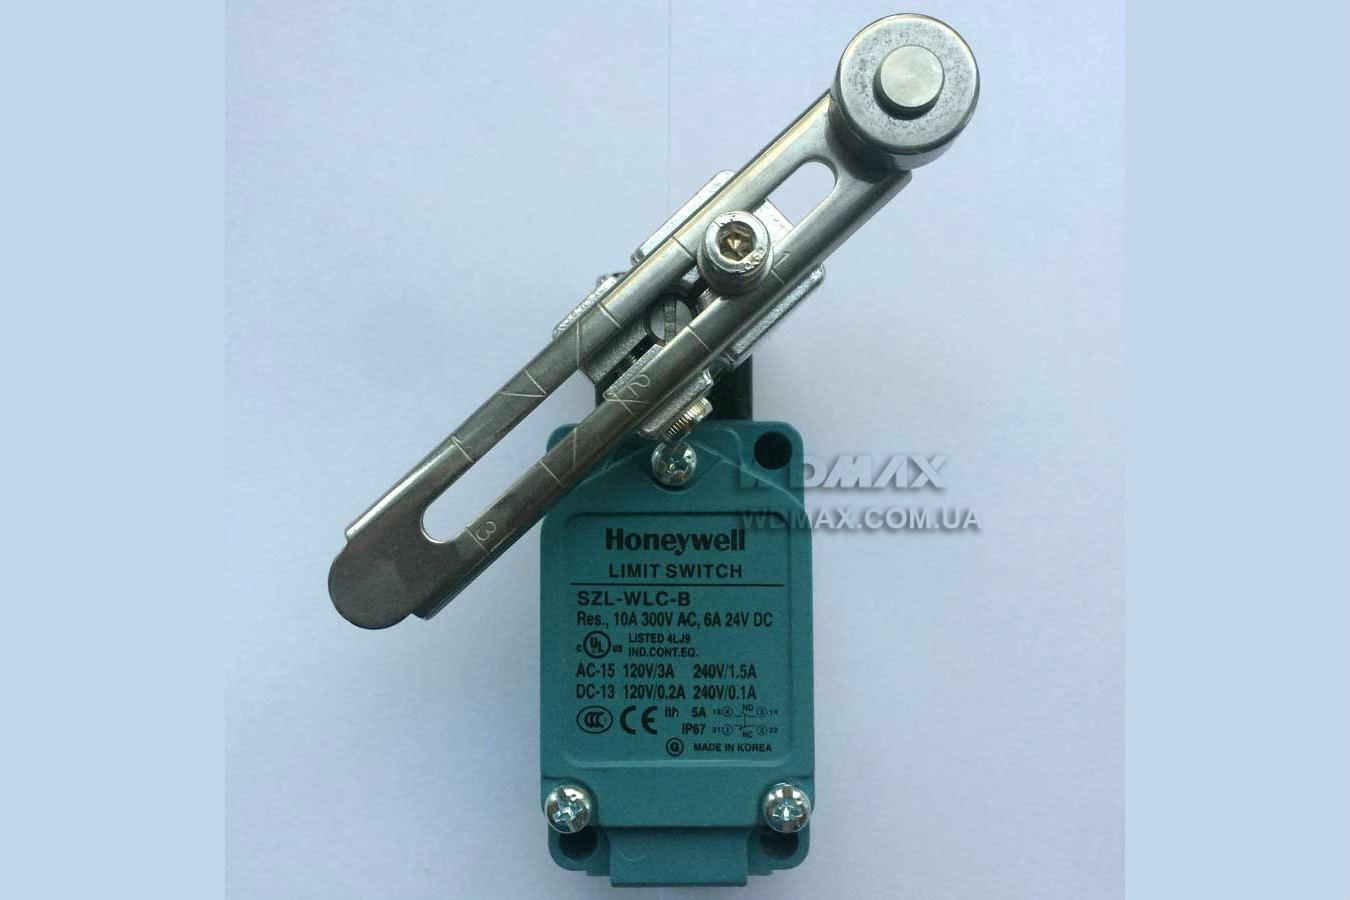 фото концевого выключателя Honeywell